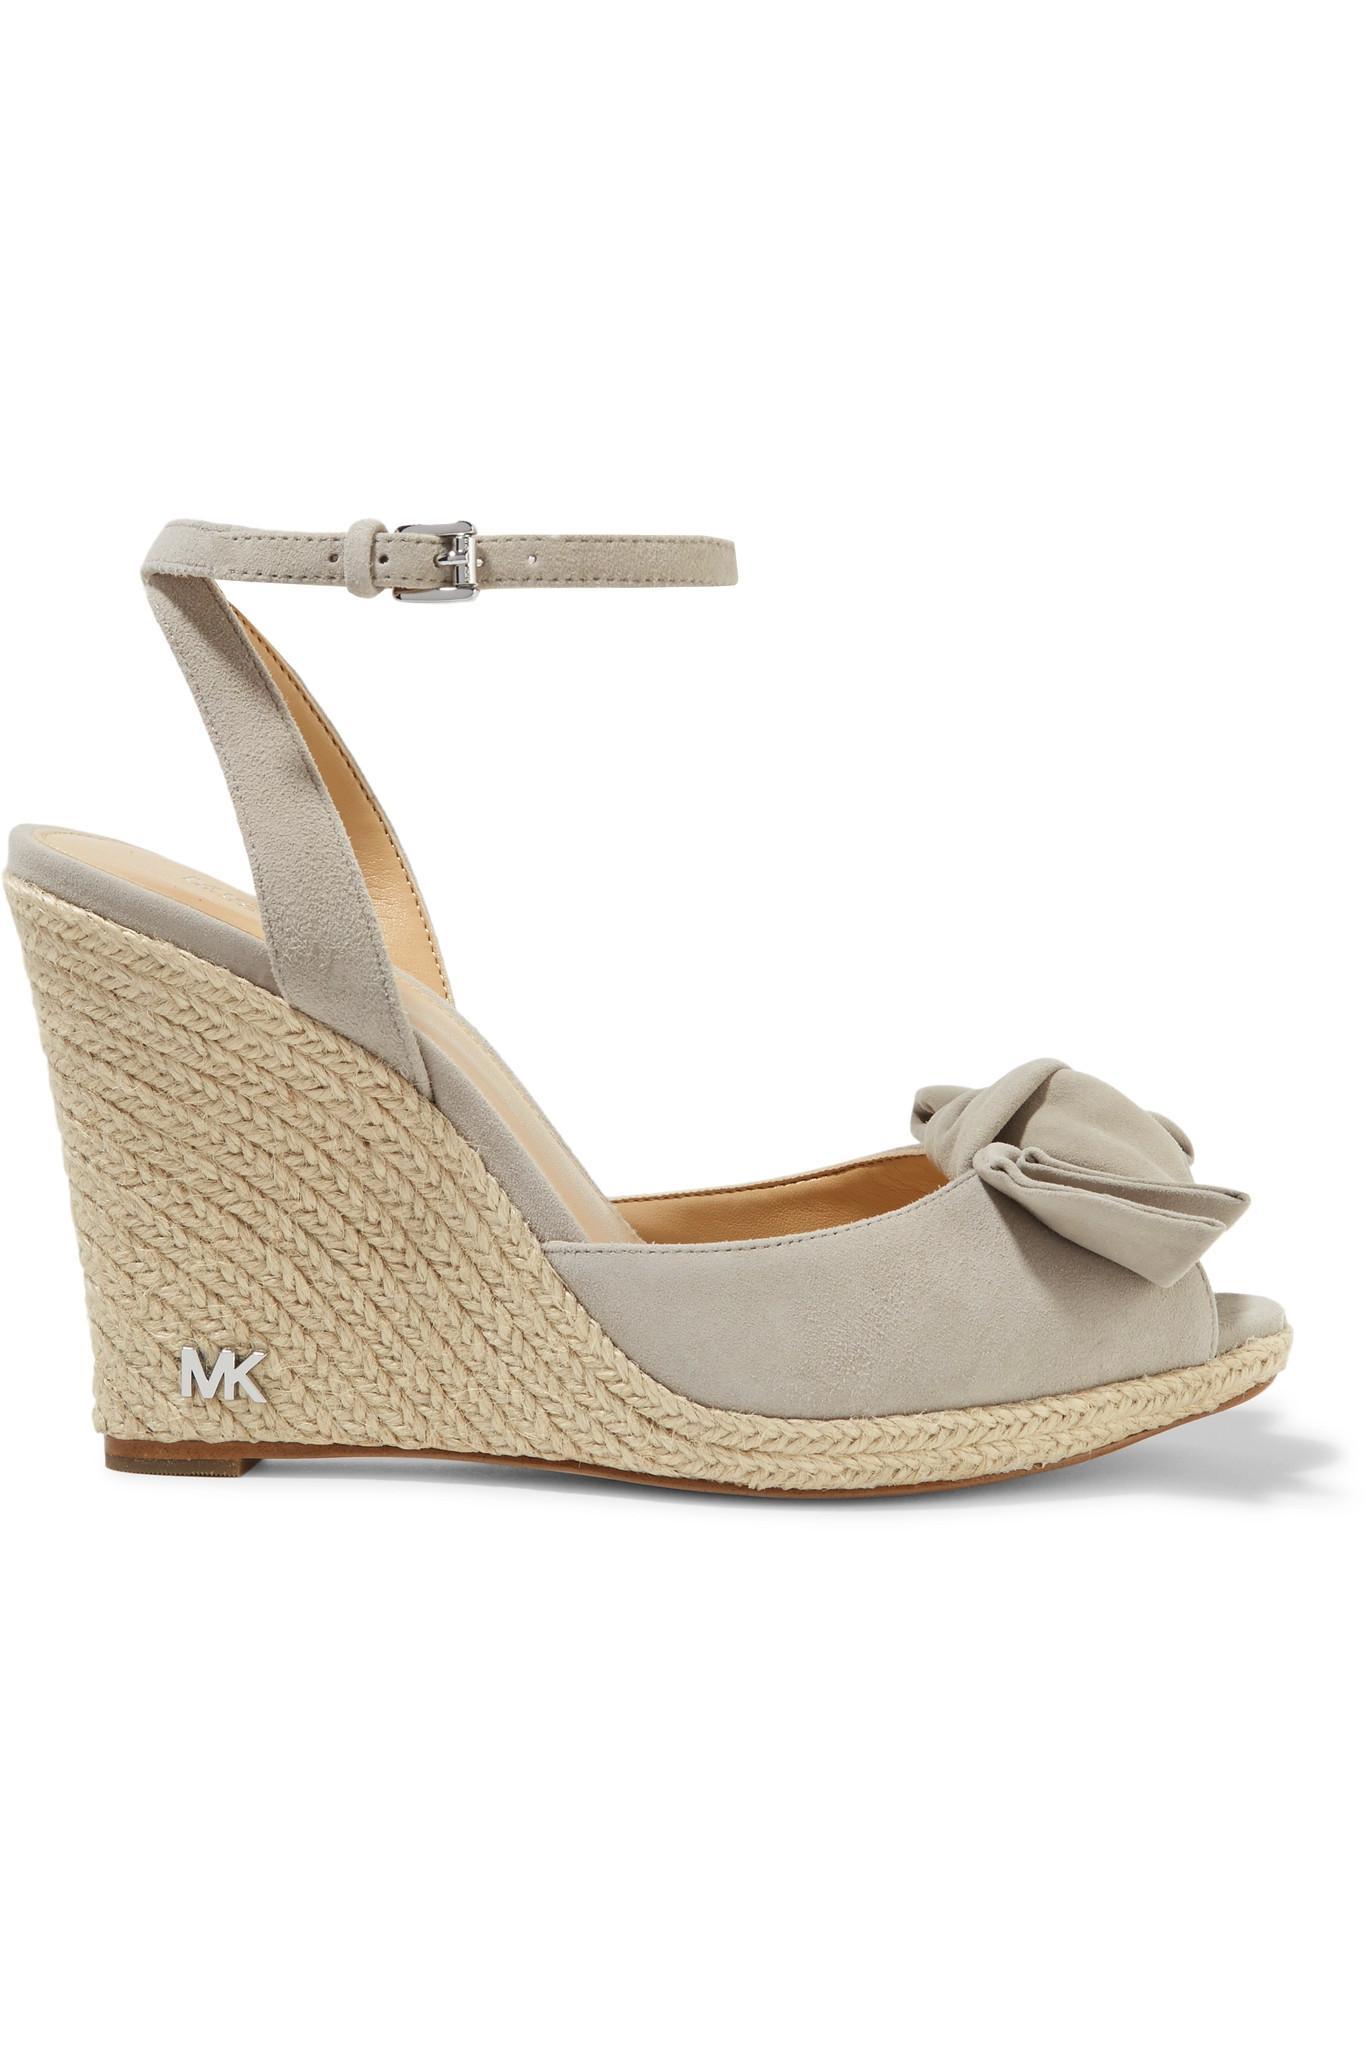 9c86ed726d1 MICHAEL Michael Kors Gray Willa Suede Espadrille Wedge Sandals